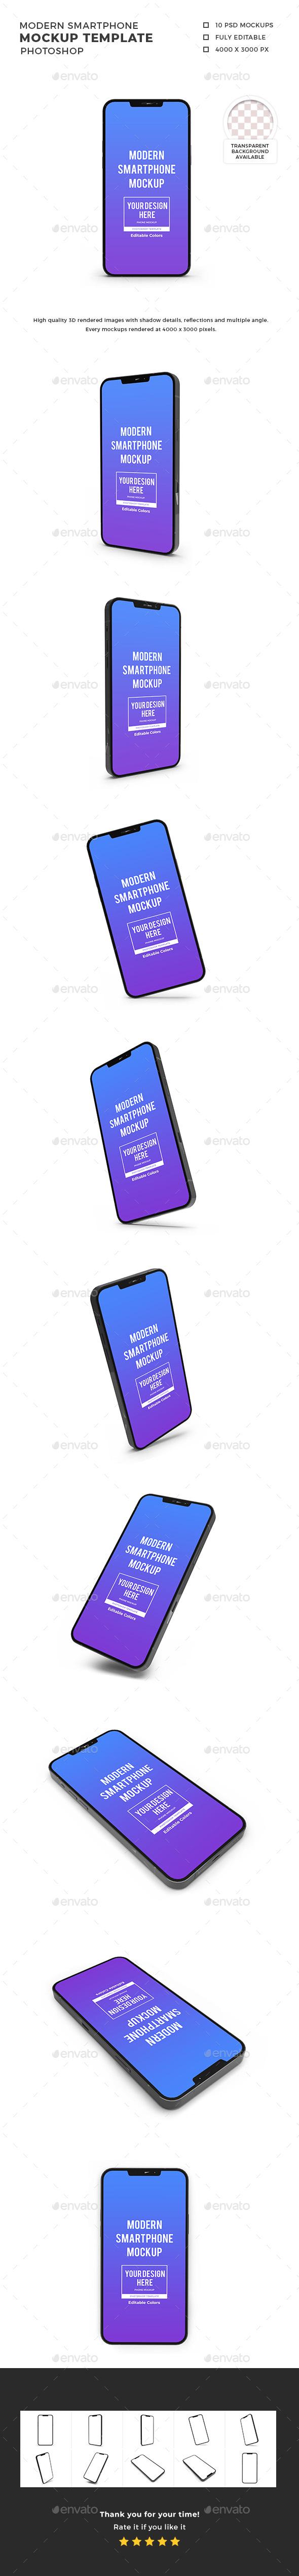 Modern Smartphone Mockup Template